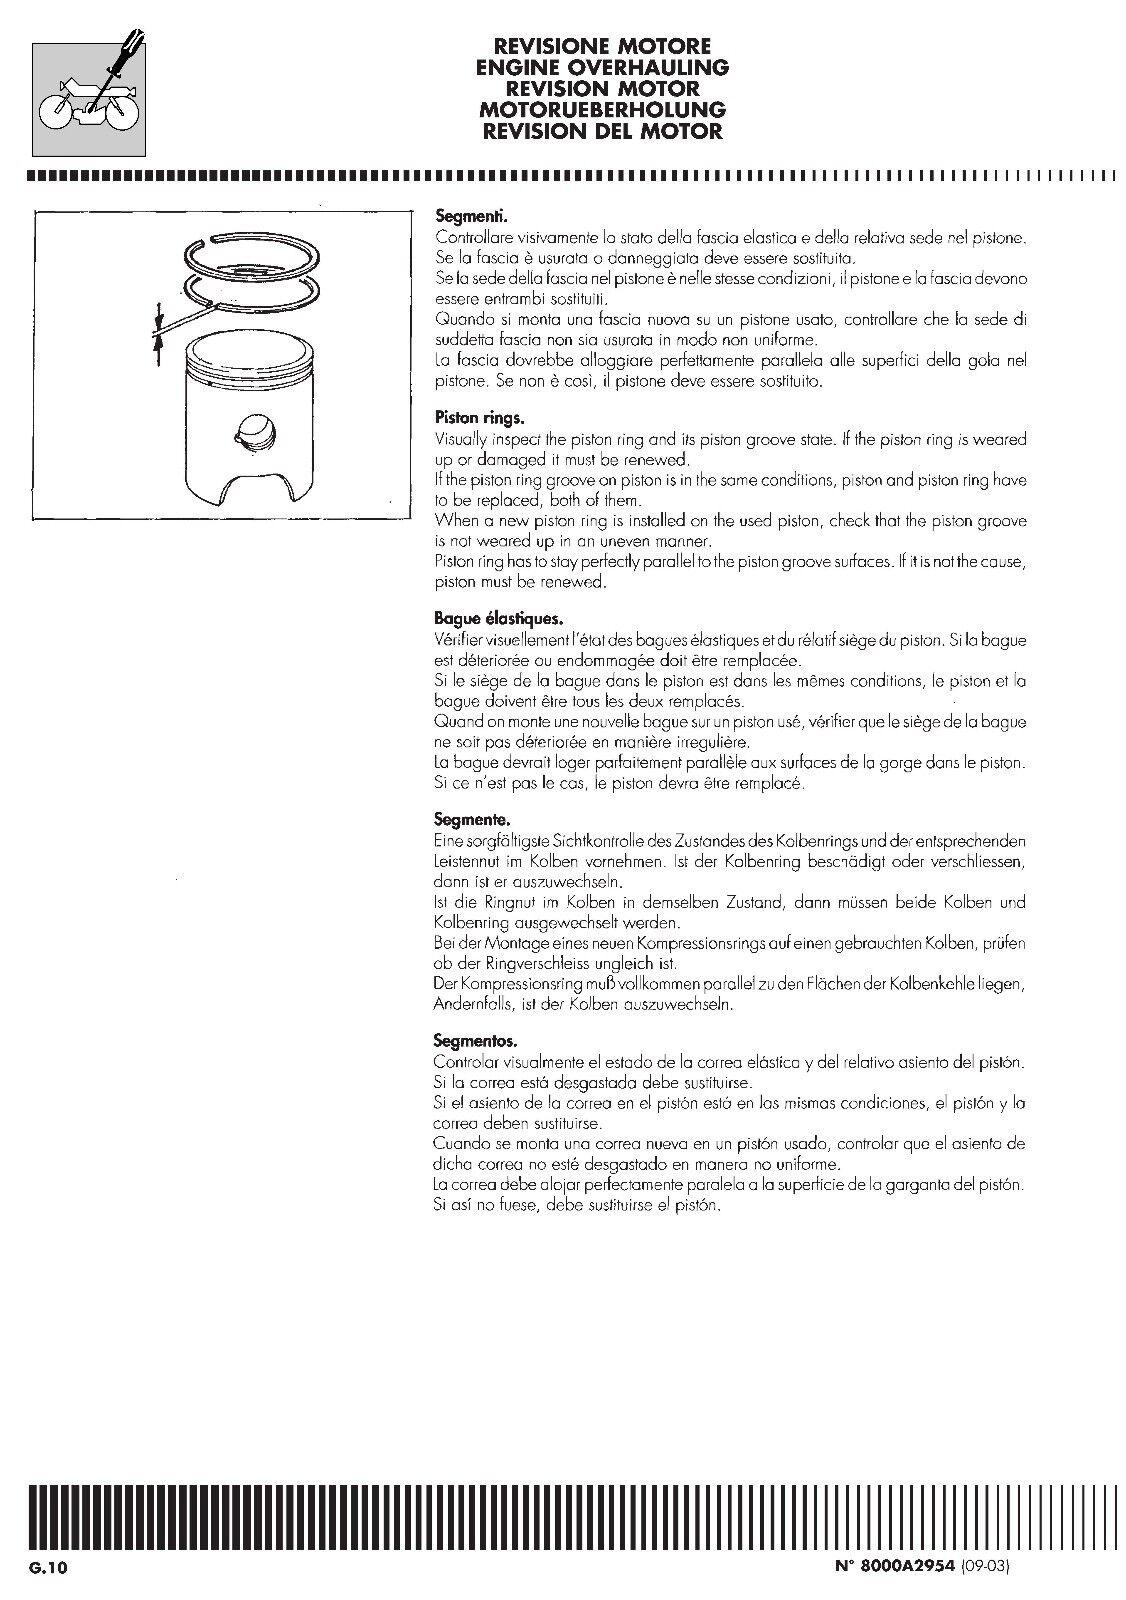 ... Husqvarna workshop service manual 2004 WR 250 & CR 250 7 of 12 ...